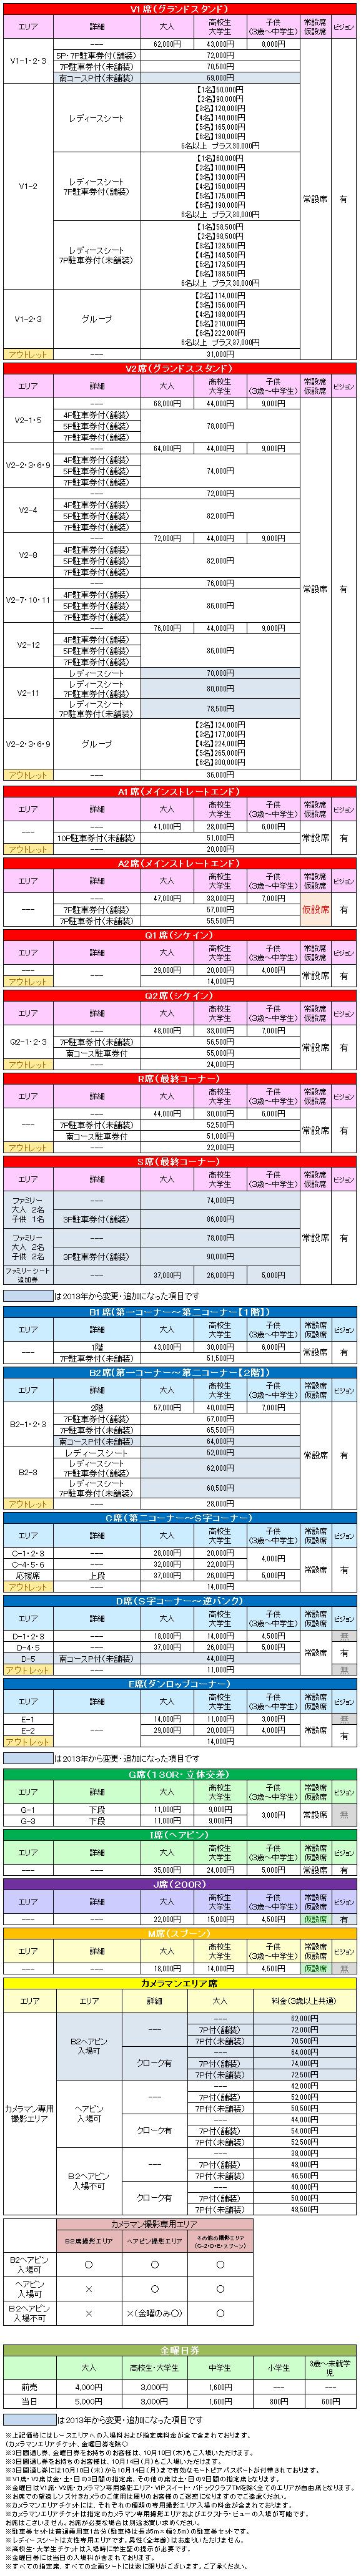 2013F1日本グランプリチケット詳細